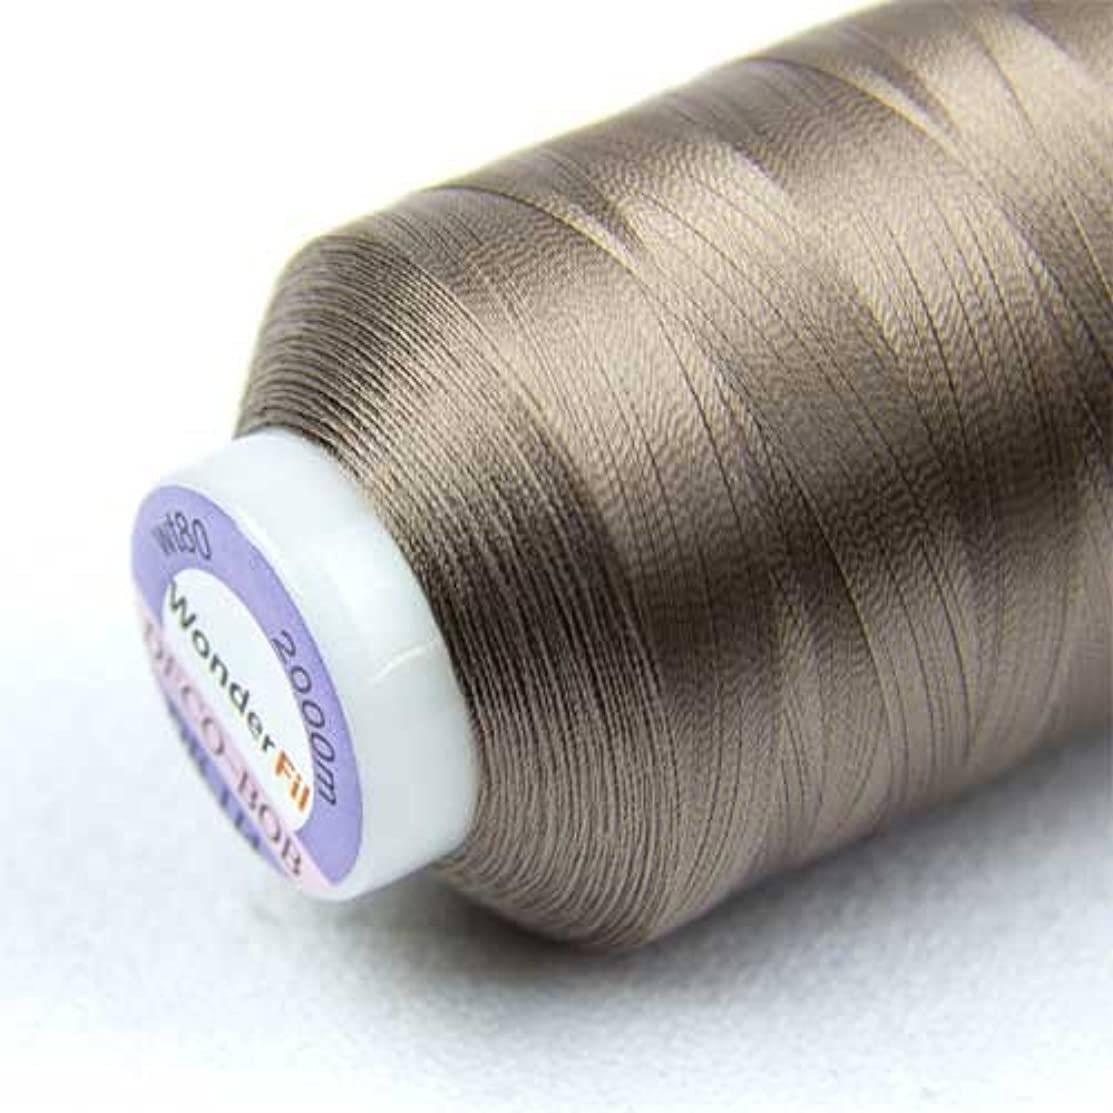 WonderFil Specialty Threads DecoBob Brown-Grey, 2-ply Cottonized Polyester, 80wt